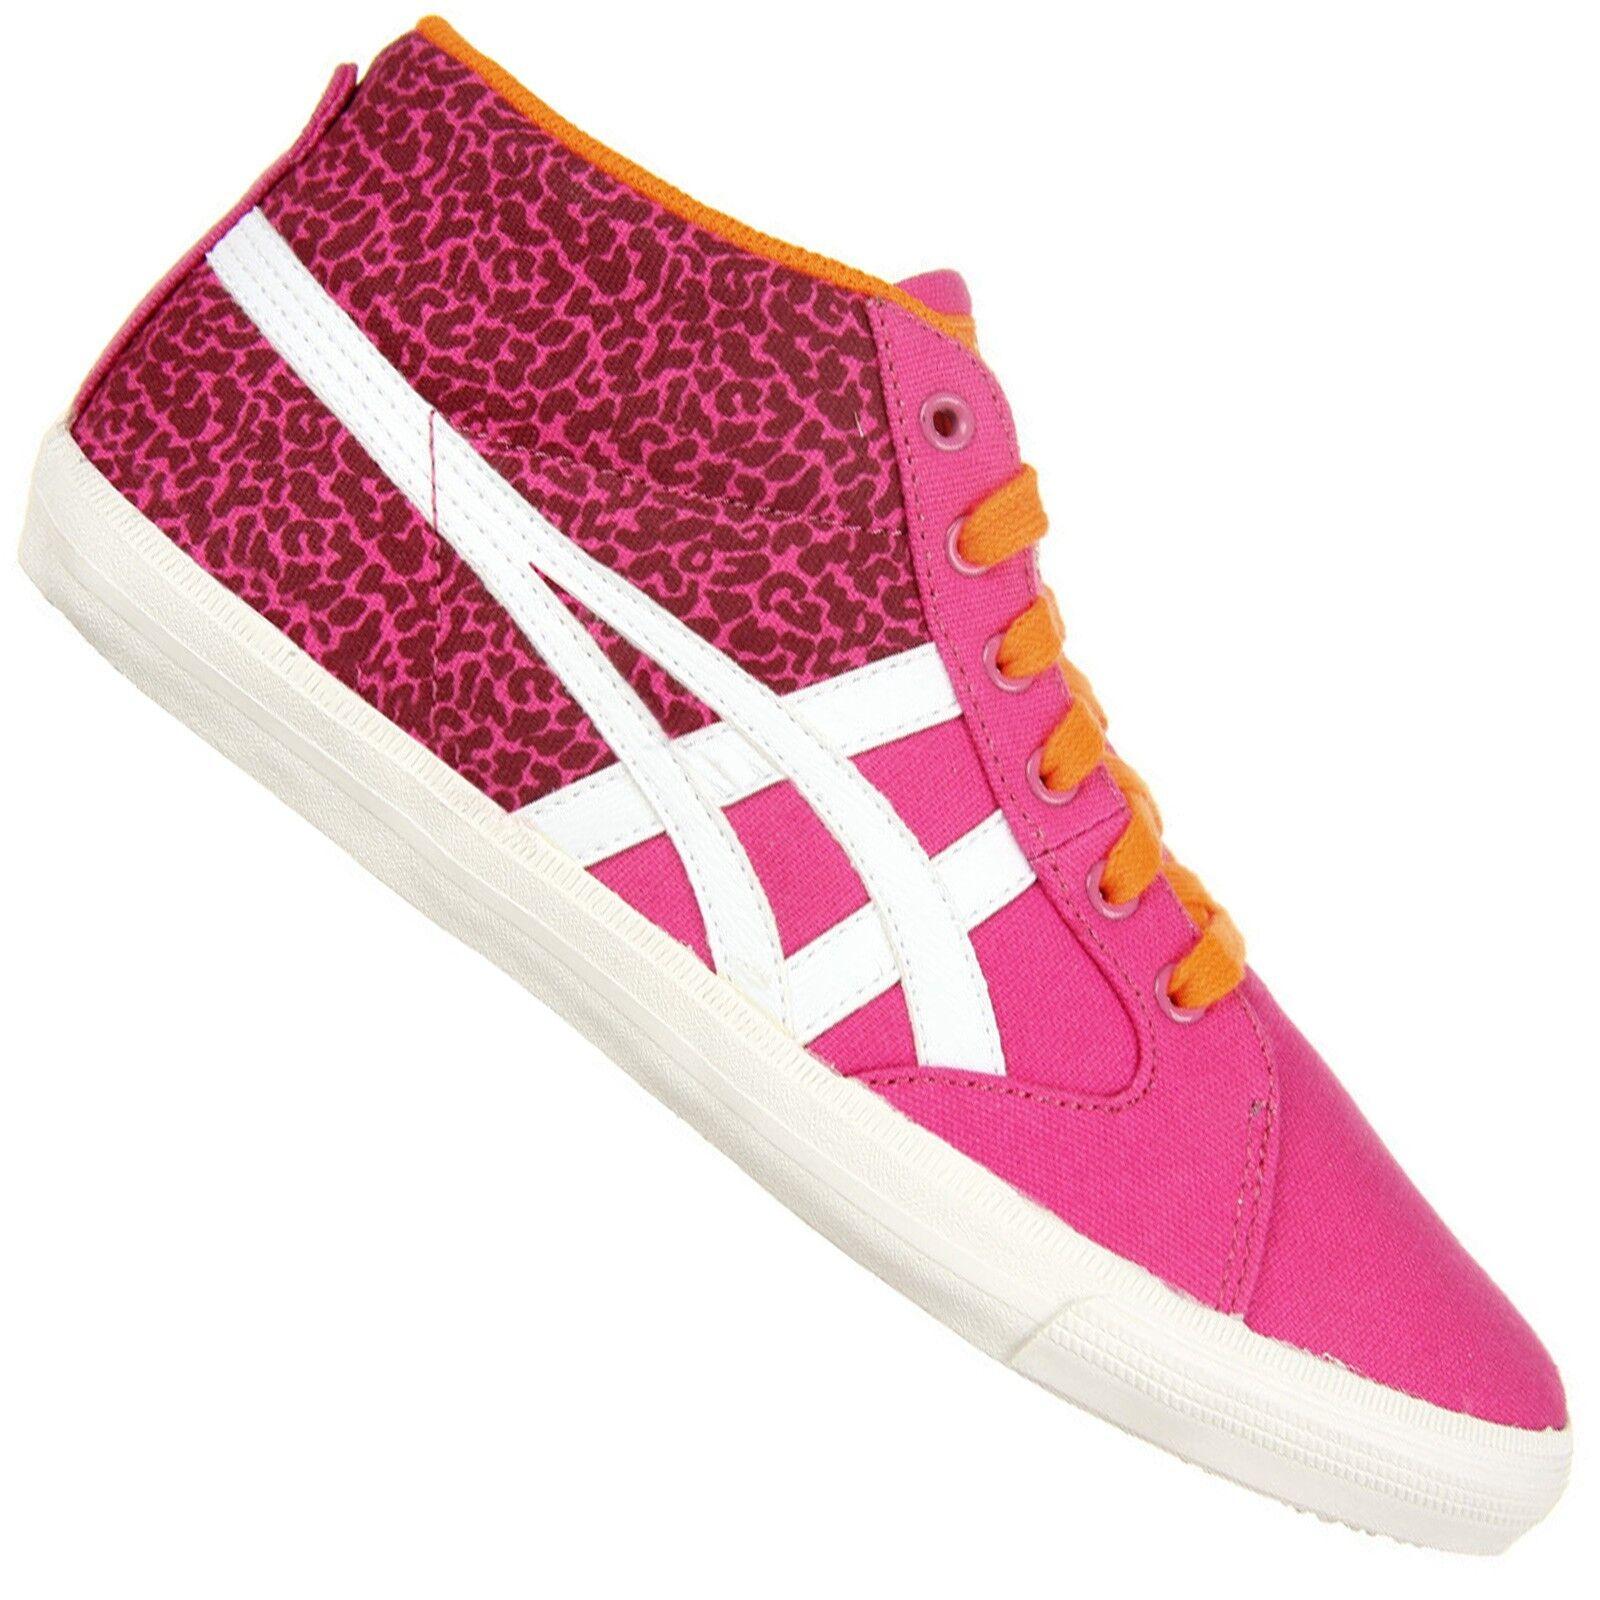 ASICS Onitsuka Tiger Farside Mid Top Sneaker Scarpe Mexico 66 LEOPARD ROSA NEON